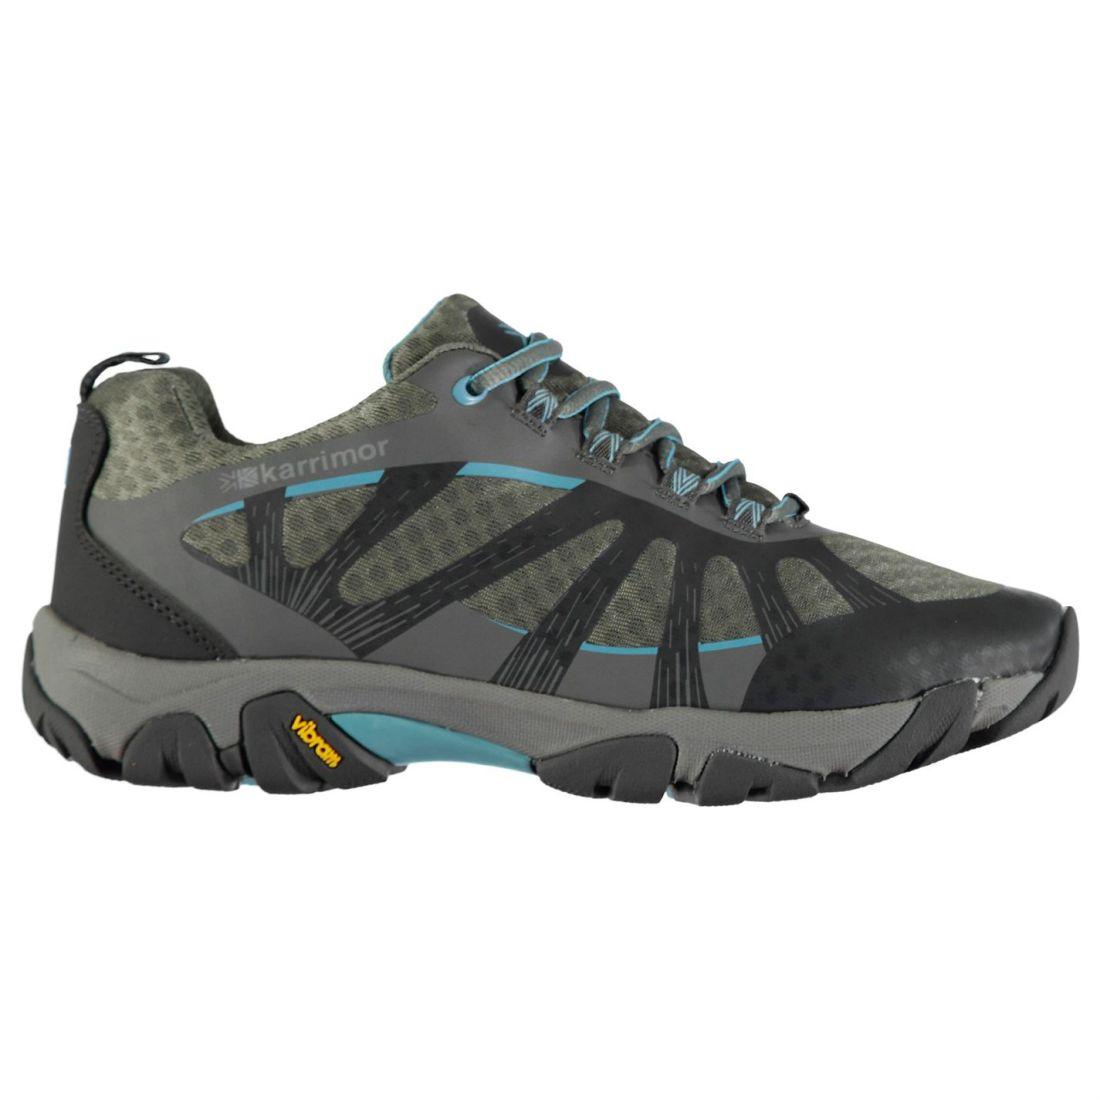 011dee44d5c7 Karrimor Serenity shoes Ladies Non Water Laces Fastened Walking Repellent  natntk15026-Women